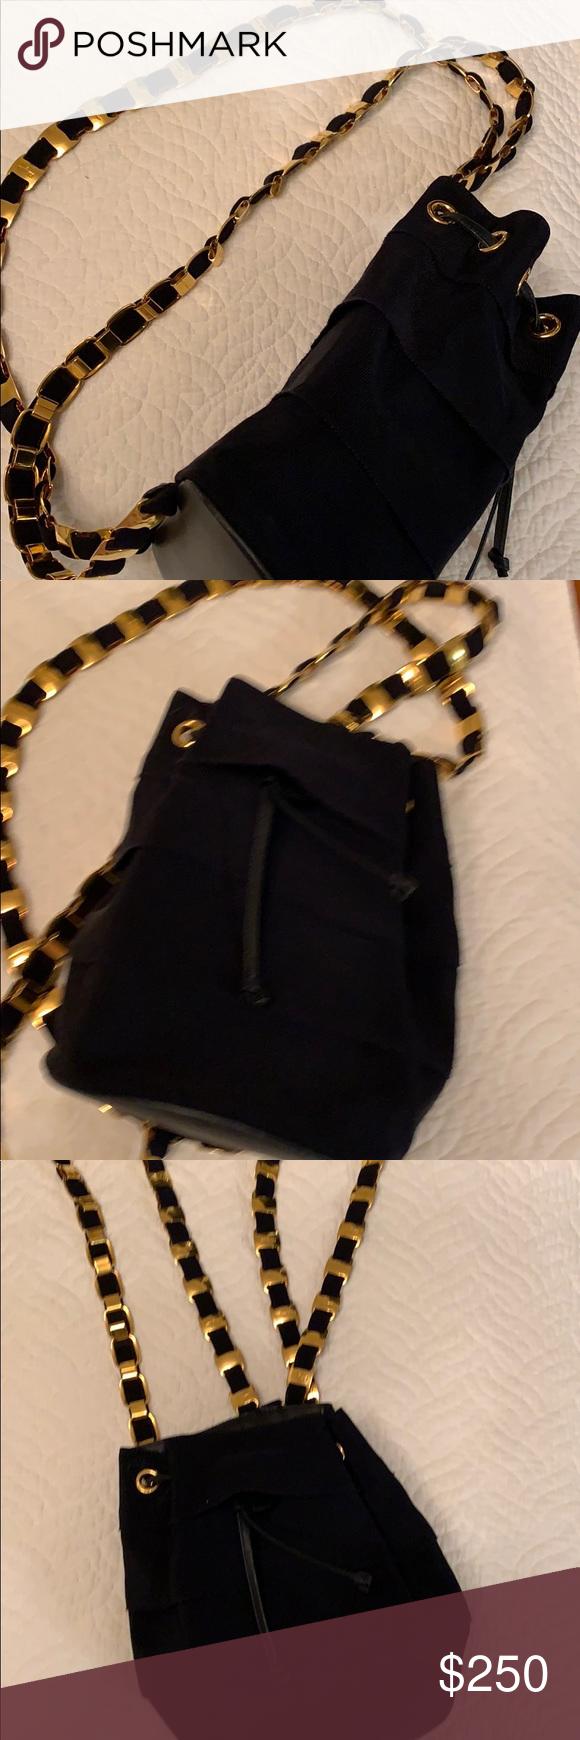 0b3abd6b89 Navy blue Ferragamo couture backpack Navy blue Ferragamo backpack. Pristine  condition Shoulder straps have heavy gauge gold Ferragamo clasps over navy.